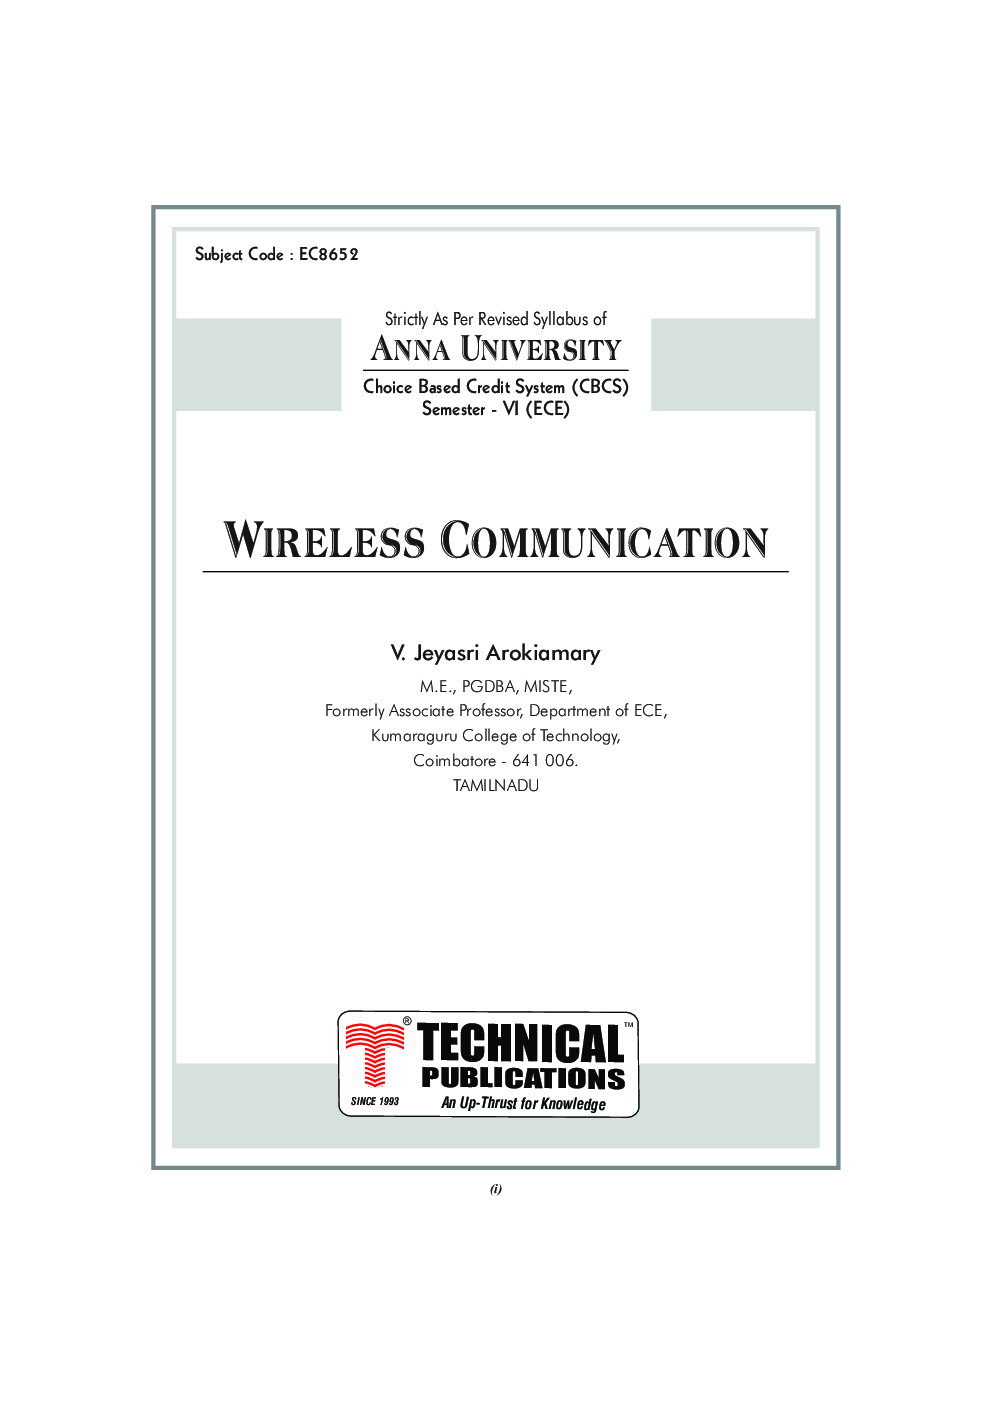 CELLULAR AND MOBILE COMMUNICATIONS BY V.JEYASRI AROKIAMARY PDF